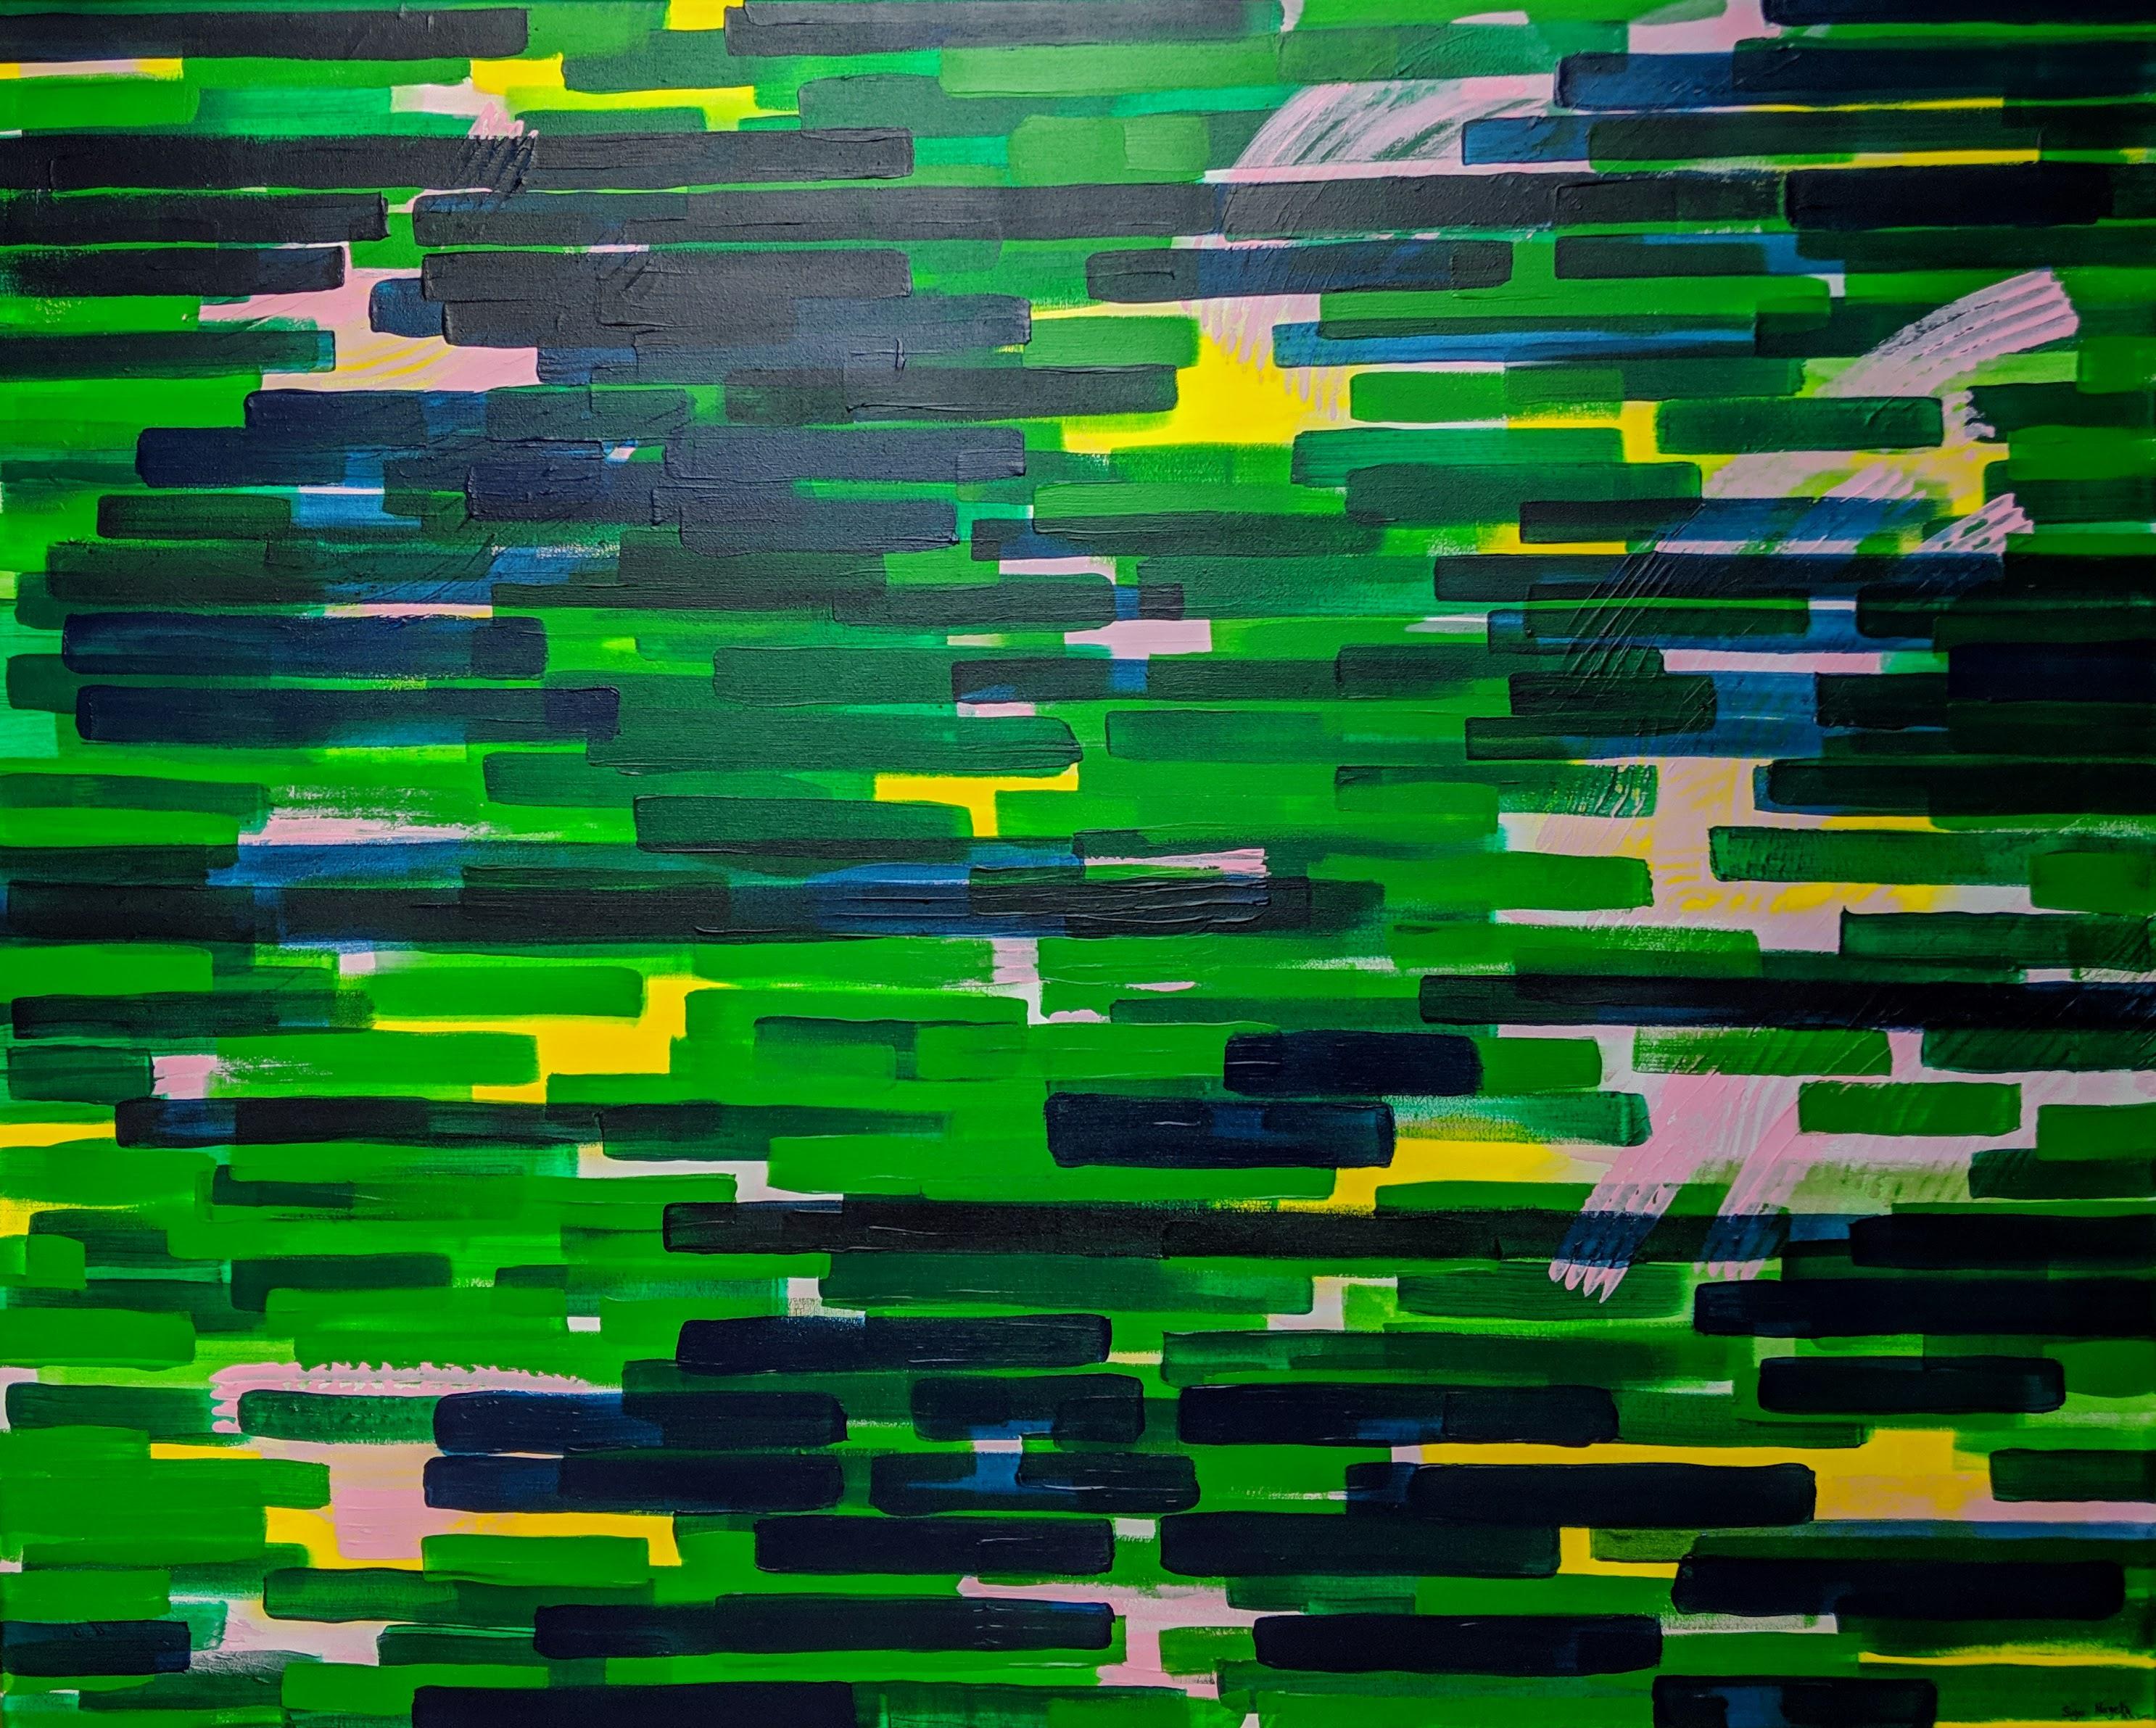 20170627_Artist Sige Nagels_Acrylic_Drift_size100x 80cm_2017June27th